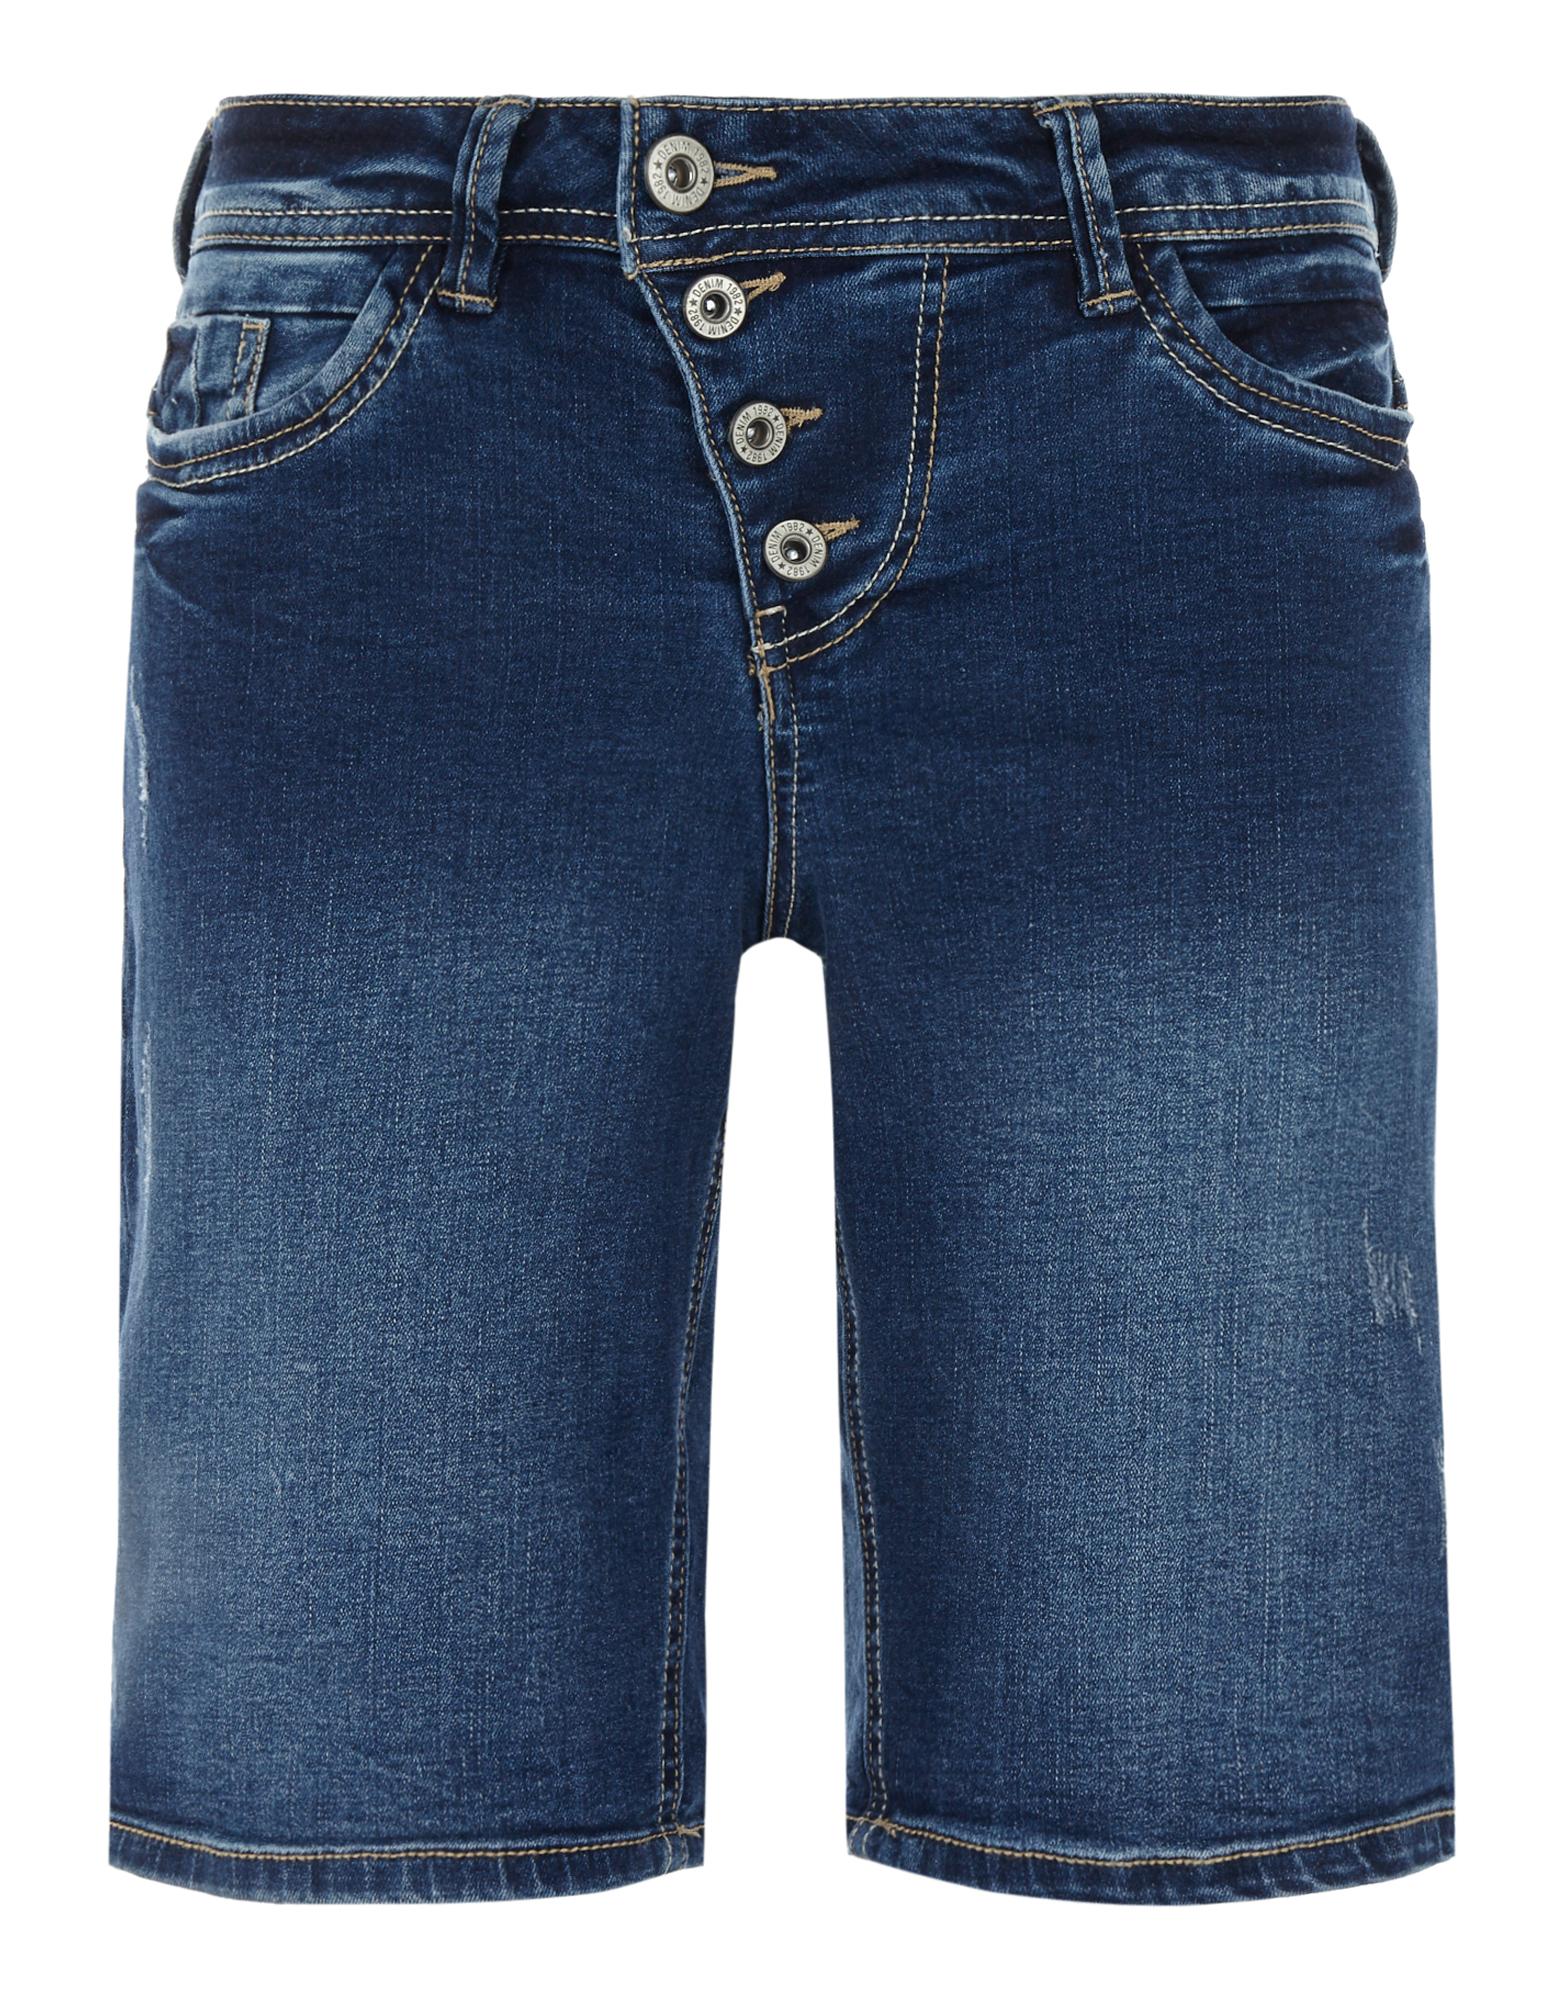 Denim 1982 Damen Stone Washed Jeansshorts im Used Look    81630551000706